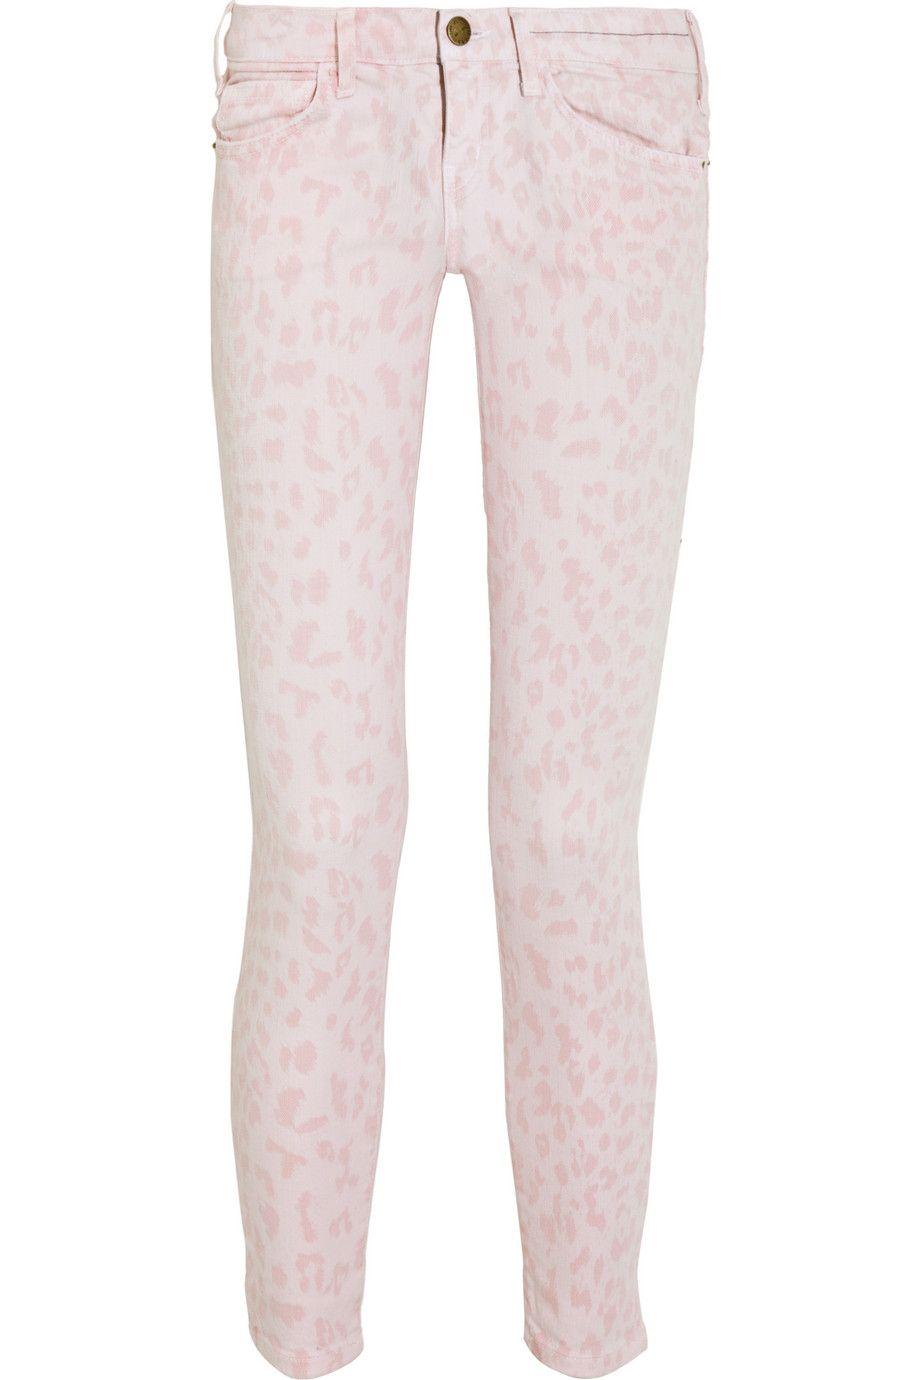 ec4b2e16aef0 Pink leopard-print skinny jeans!? | fashion | Jeans, Printed skinny ...